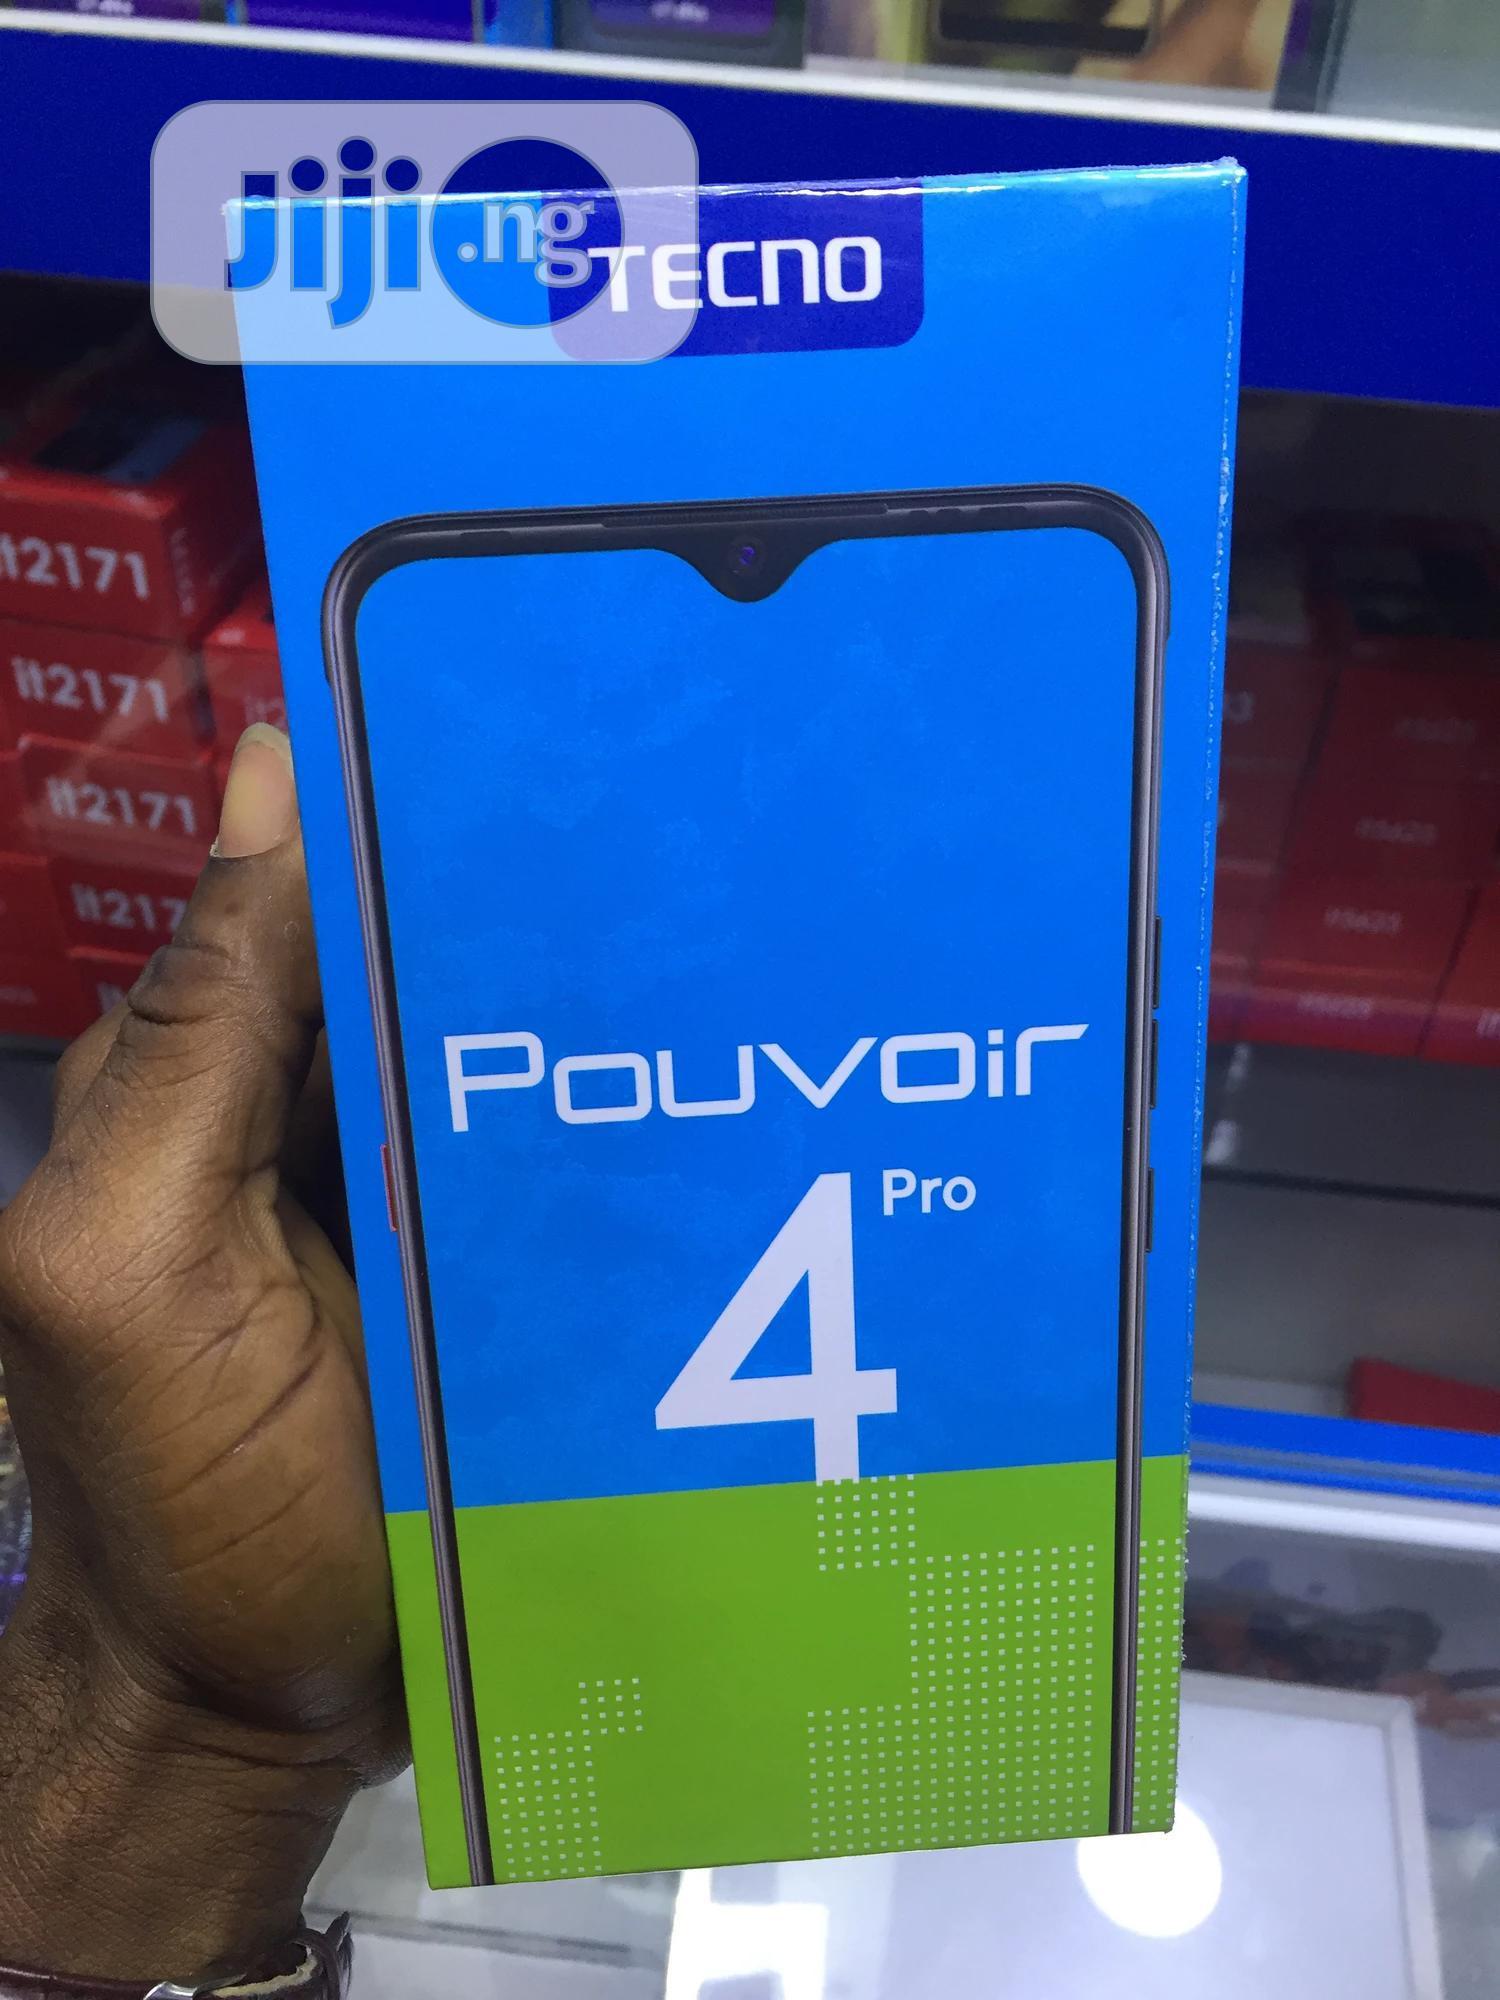 New Tecno Pouvoir 4 Pro 128 GB | Mobile Phones for sale in Ikeja, Lagos State, Nigeria